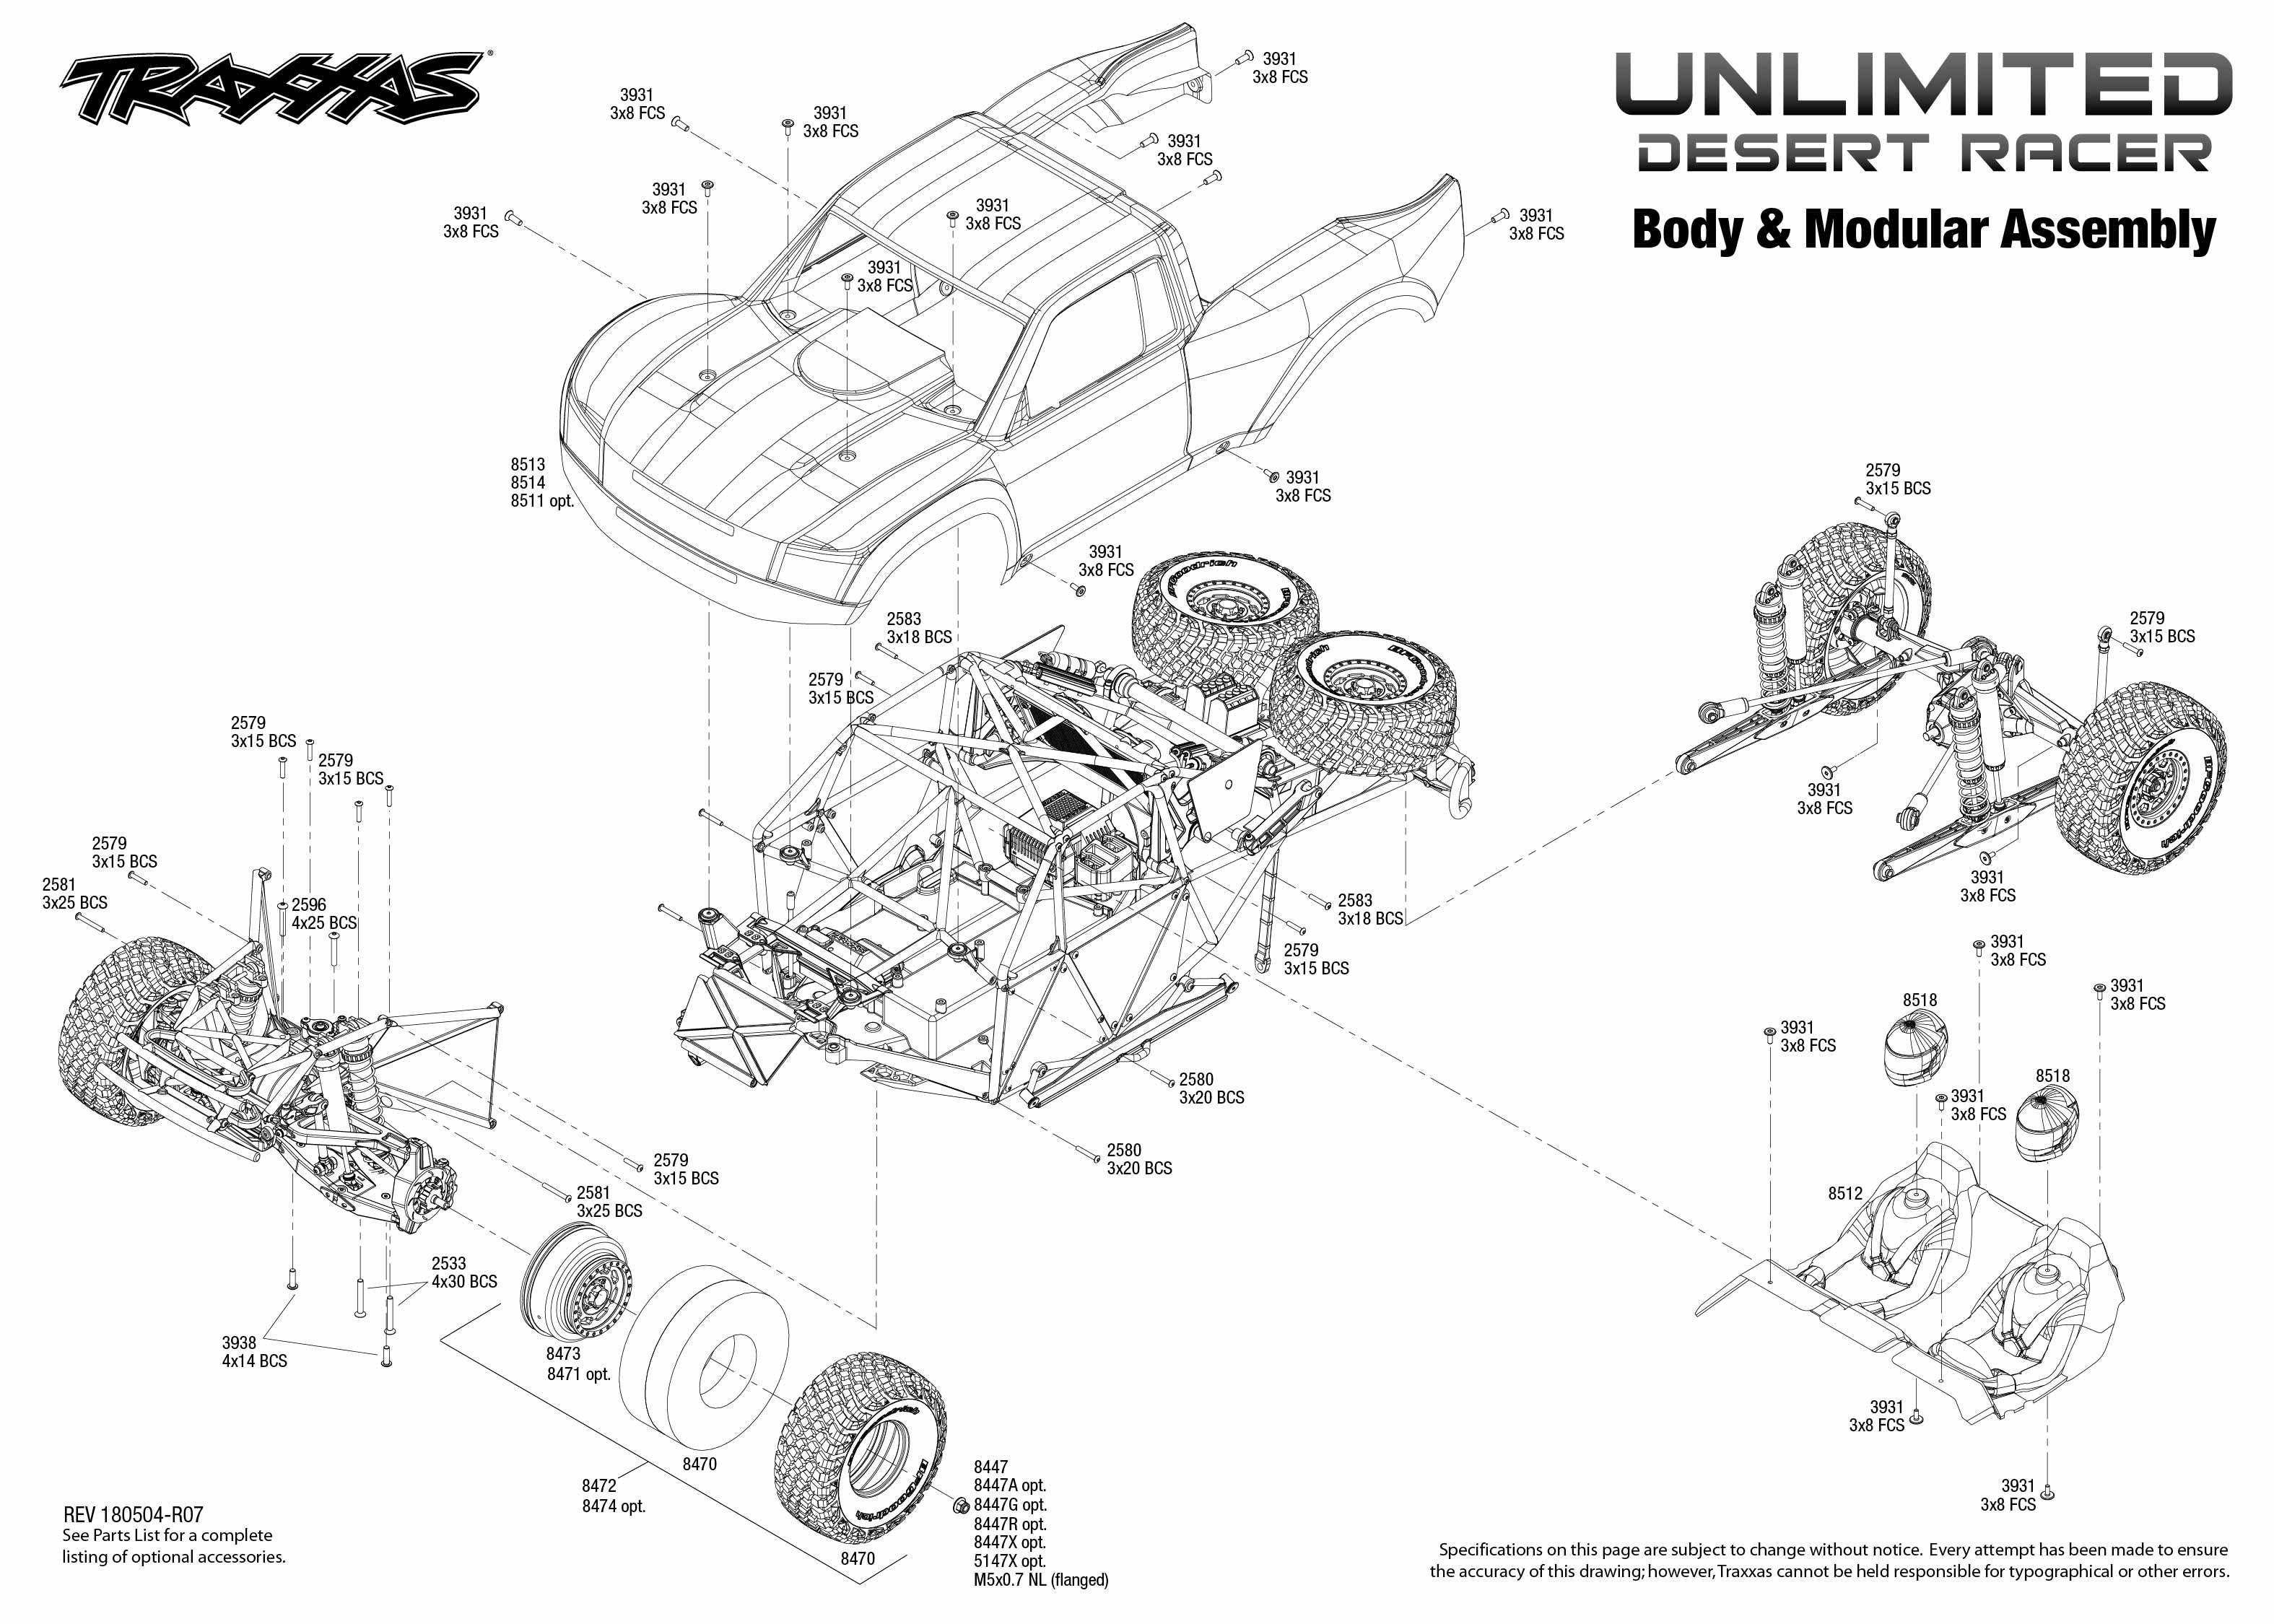 Traxxas Unlimited Desert Racer UDR   EuroRC com